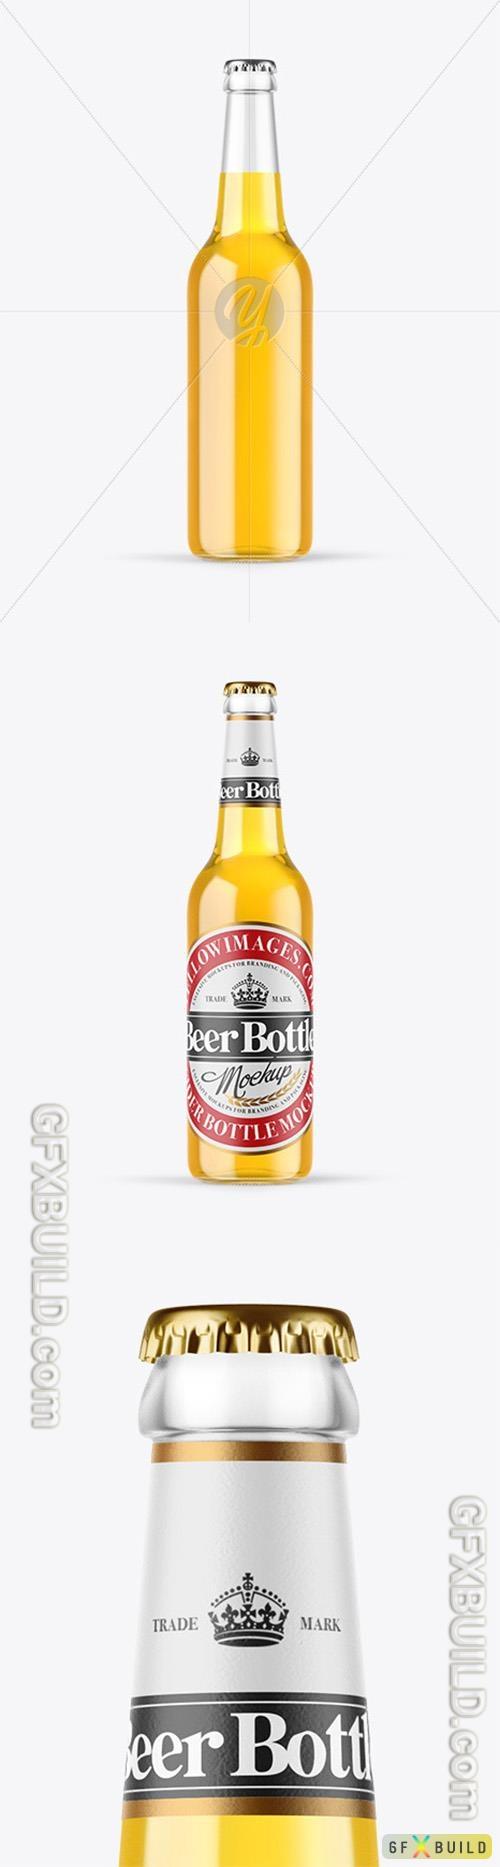 Clear Glass Lager Beer Bottle Mockup 89396